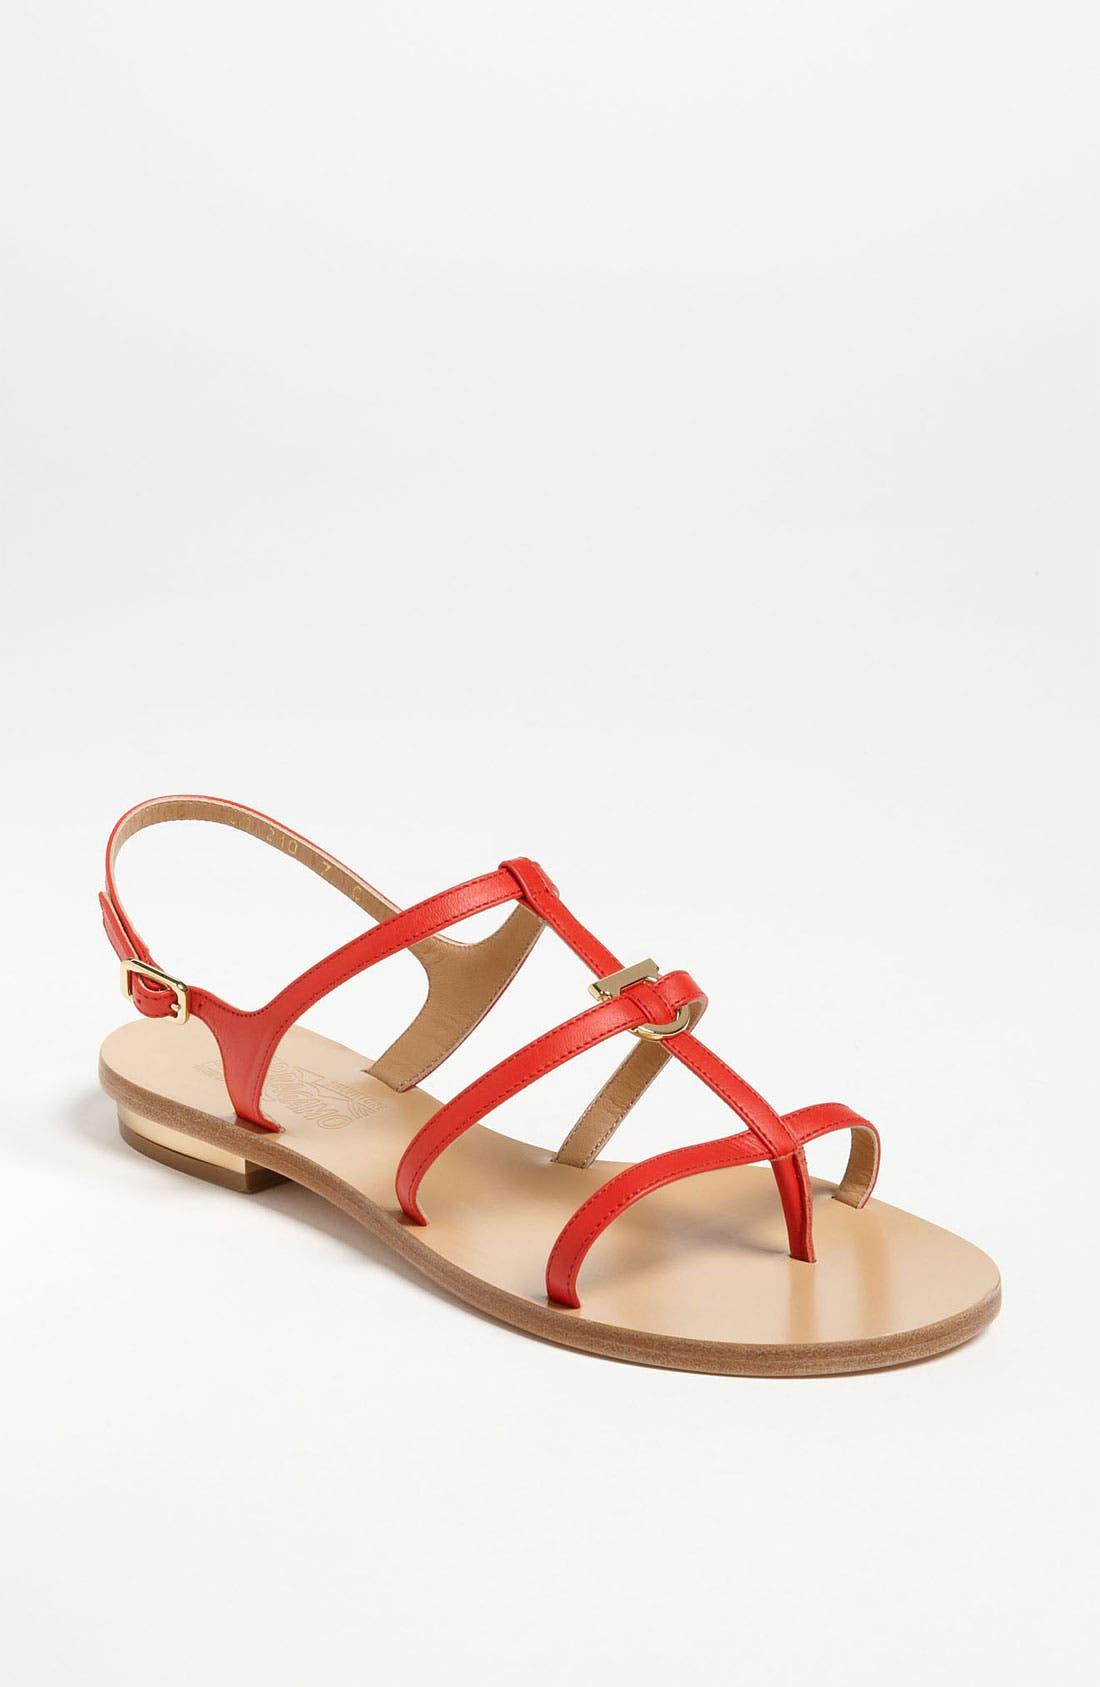 Alternate Image 1 Selected - Salvatore Ferragamo 'Senia' Sandal